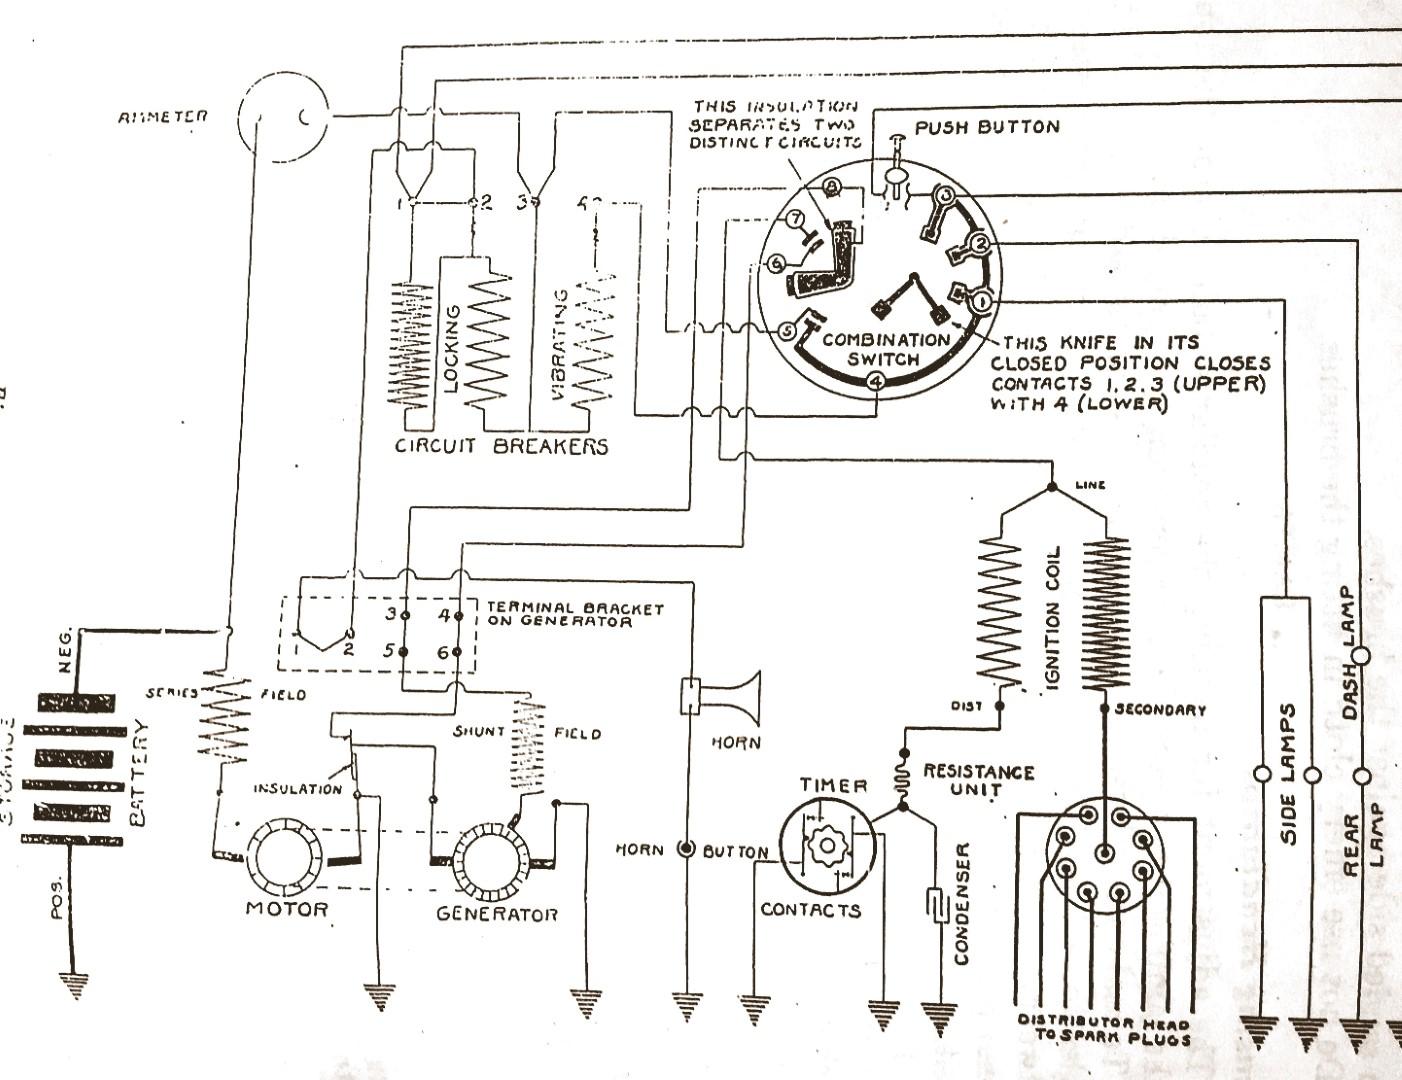 delco starter generator wiring diagram delco 1920 starter generator question page 2 buick pre war  delco 1920 starter generator question